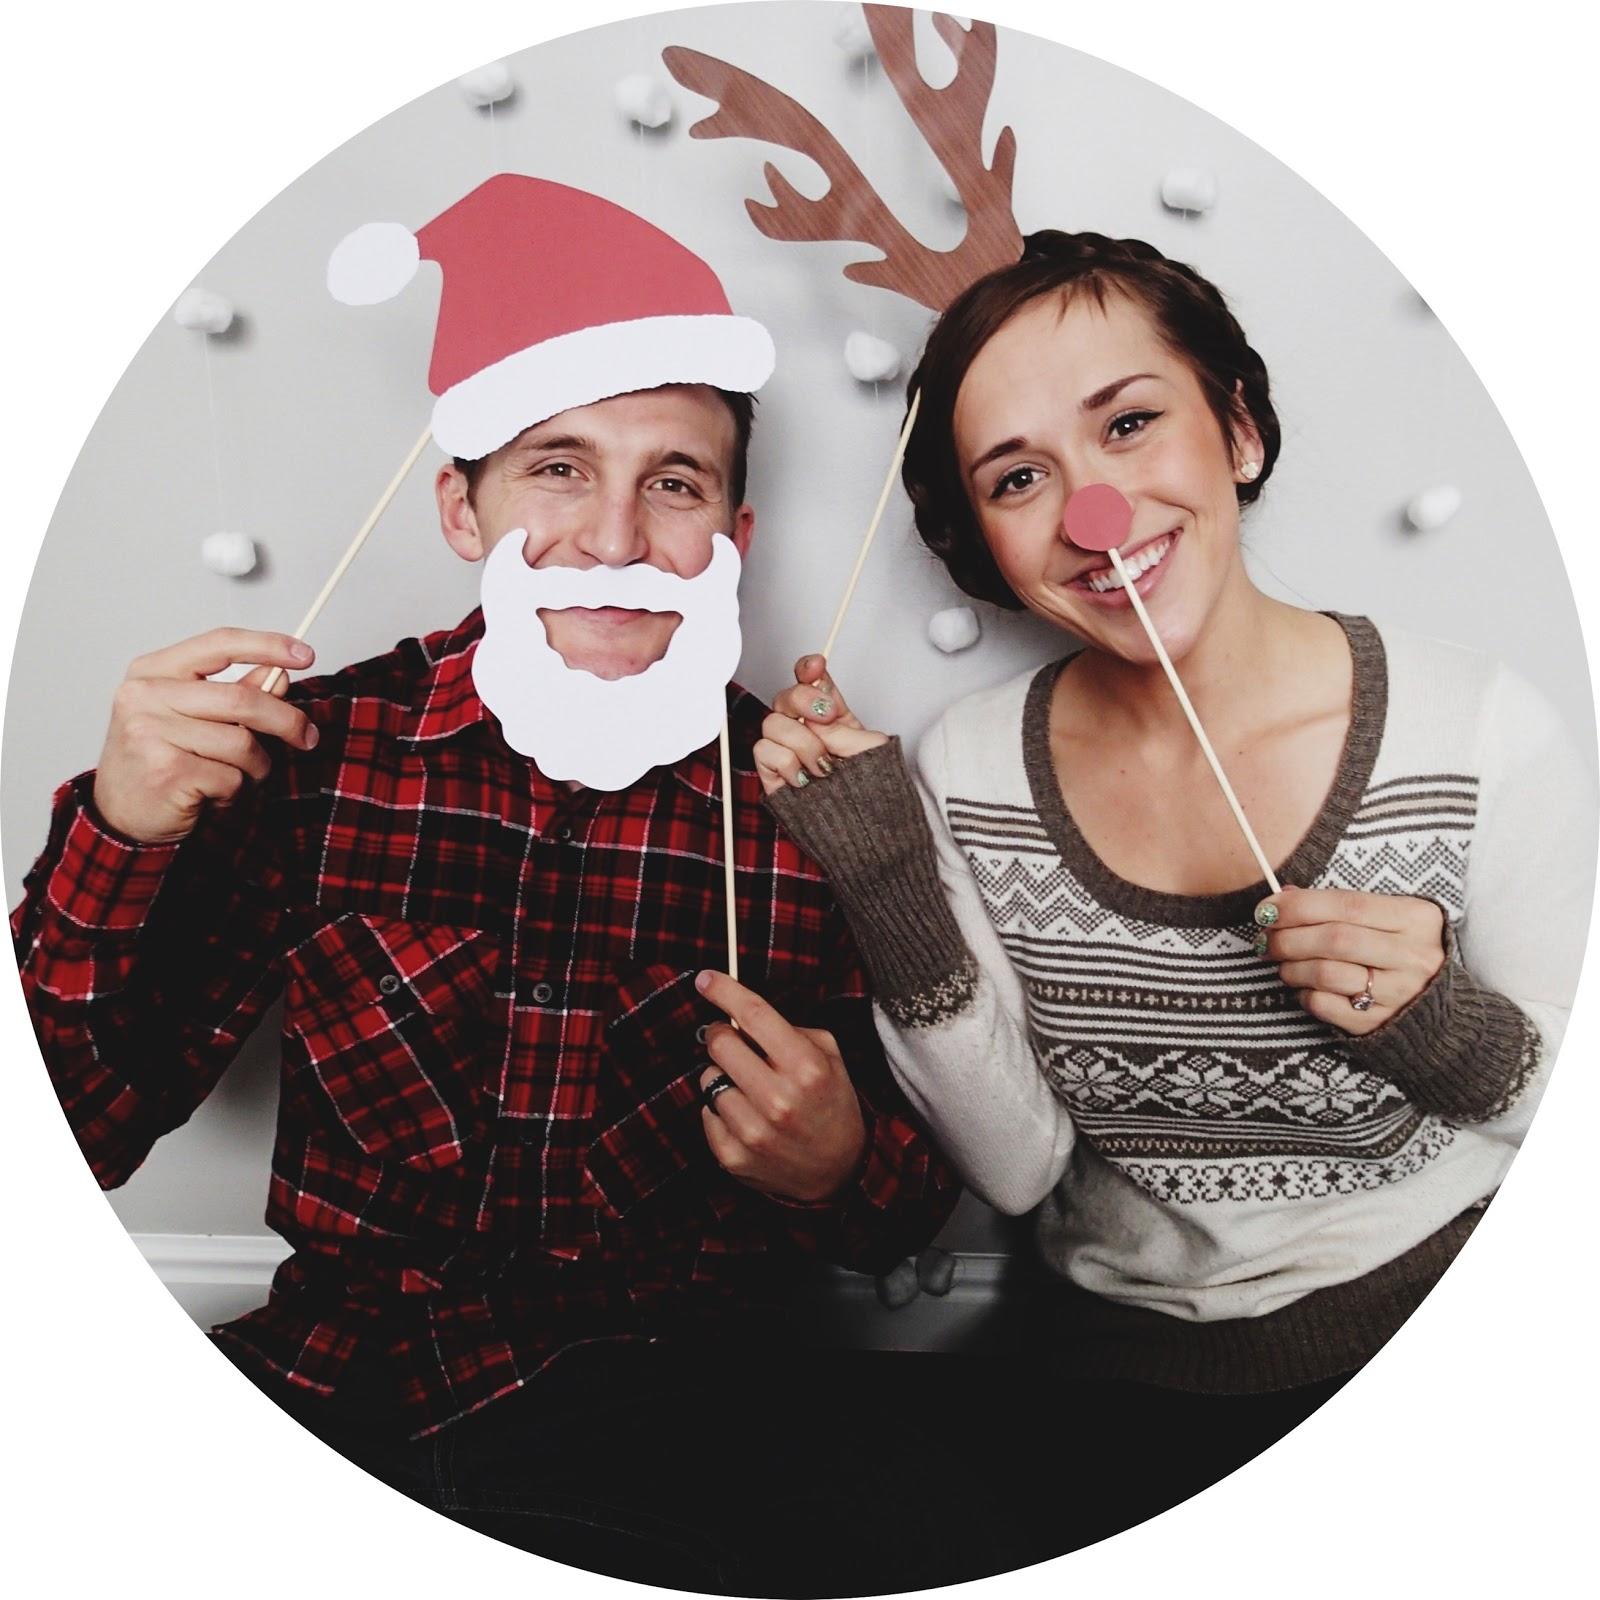 LIFE IS SWEET: Christmas Card Photos: Take 2